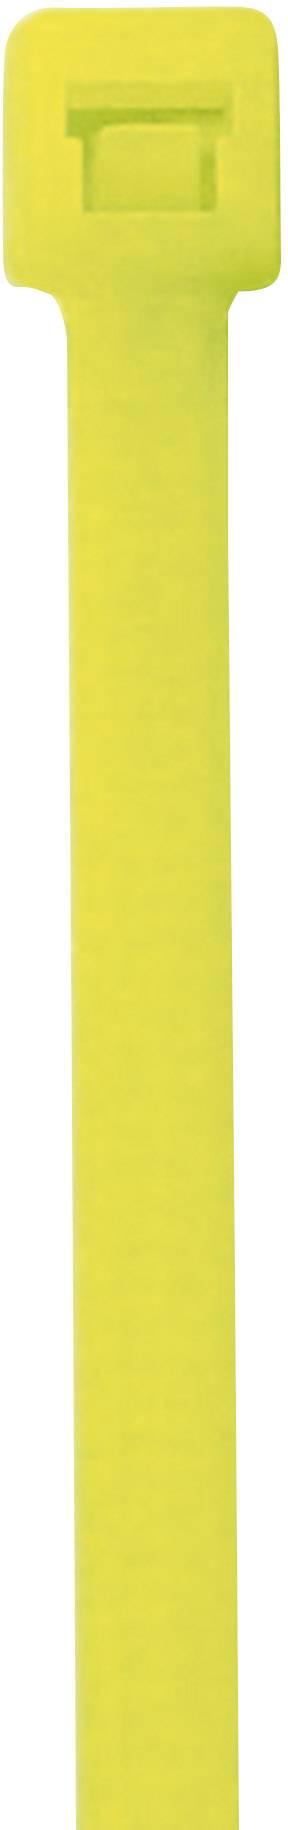 Neonska kabelska vezica, fluorescenčna (D x Š) 285 mm x 4.6 mm roza, 50 kosov, PB Fastener